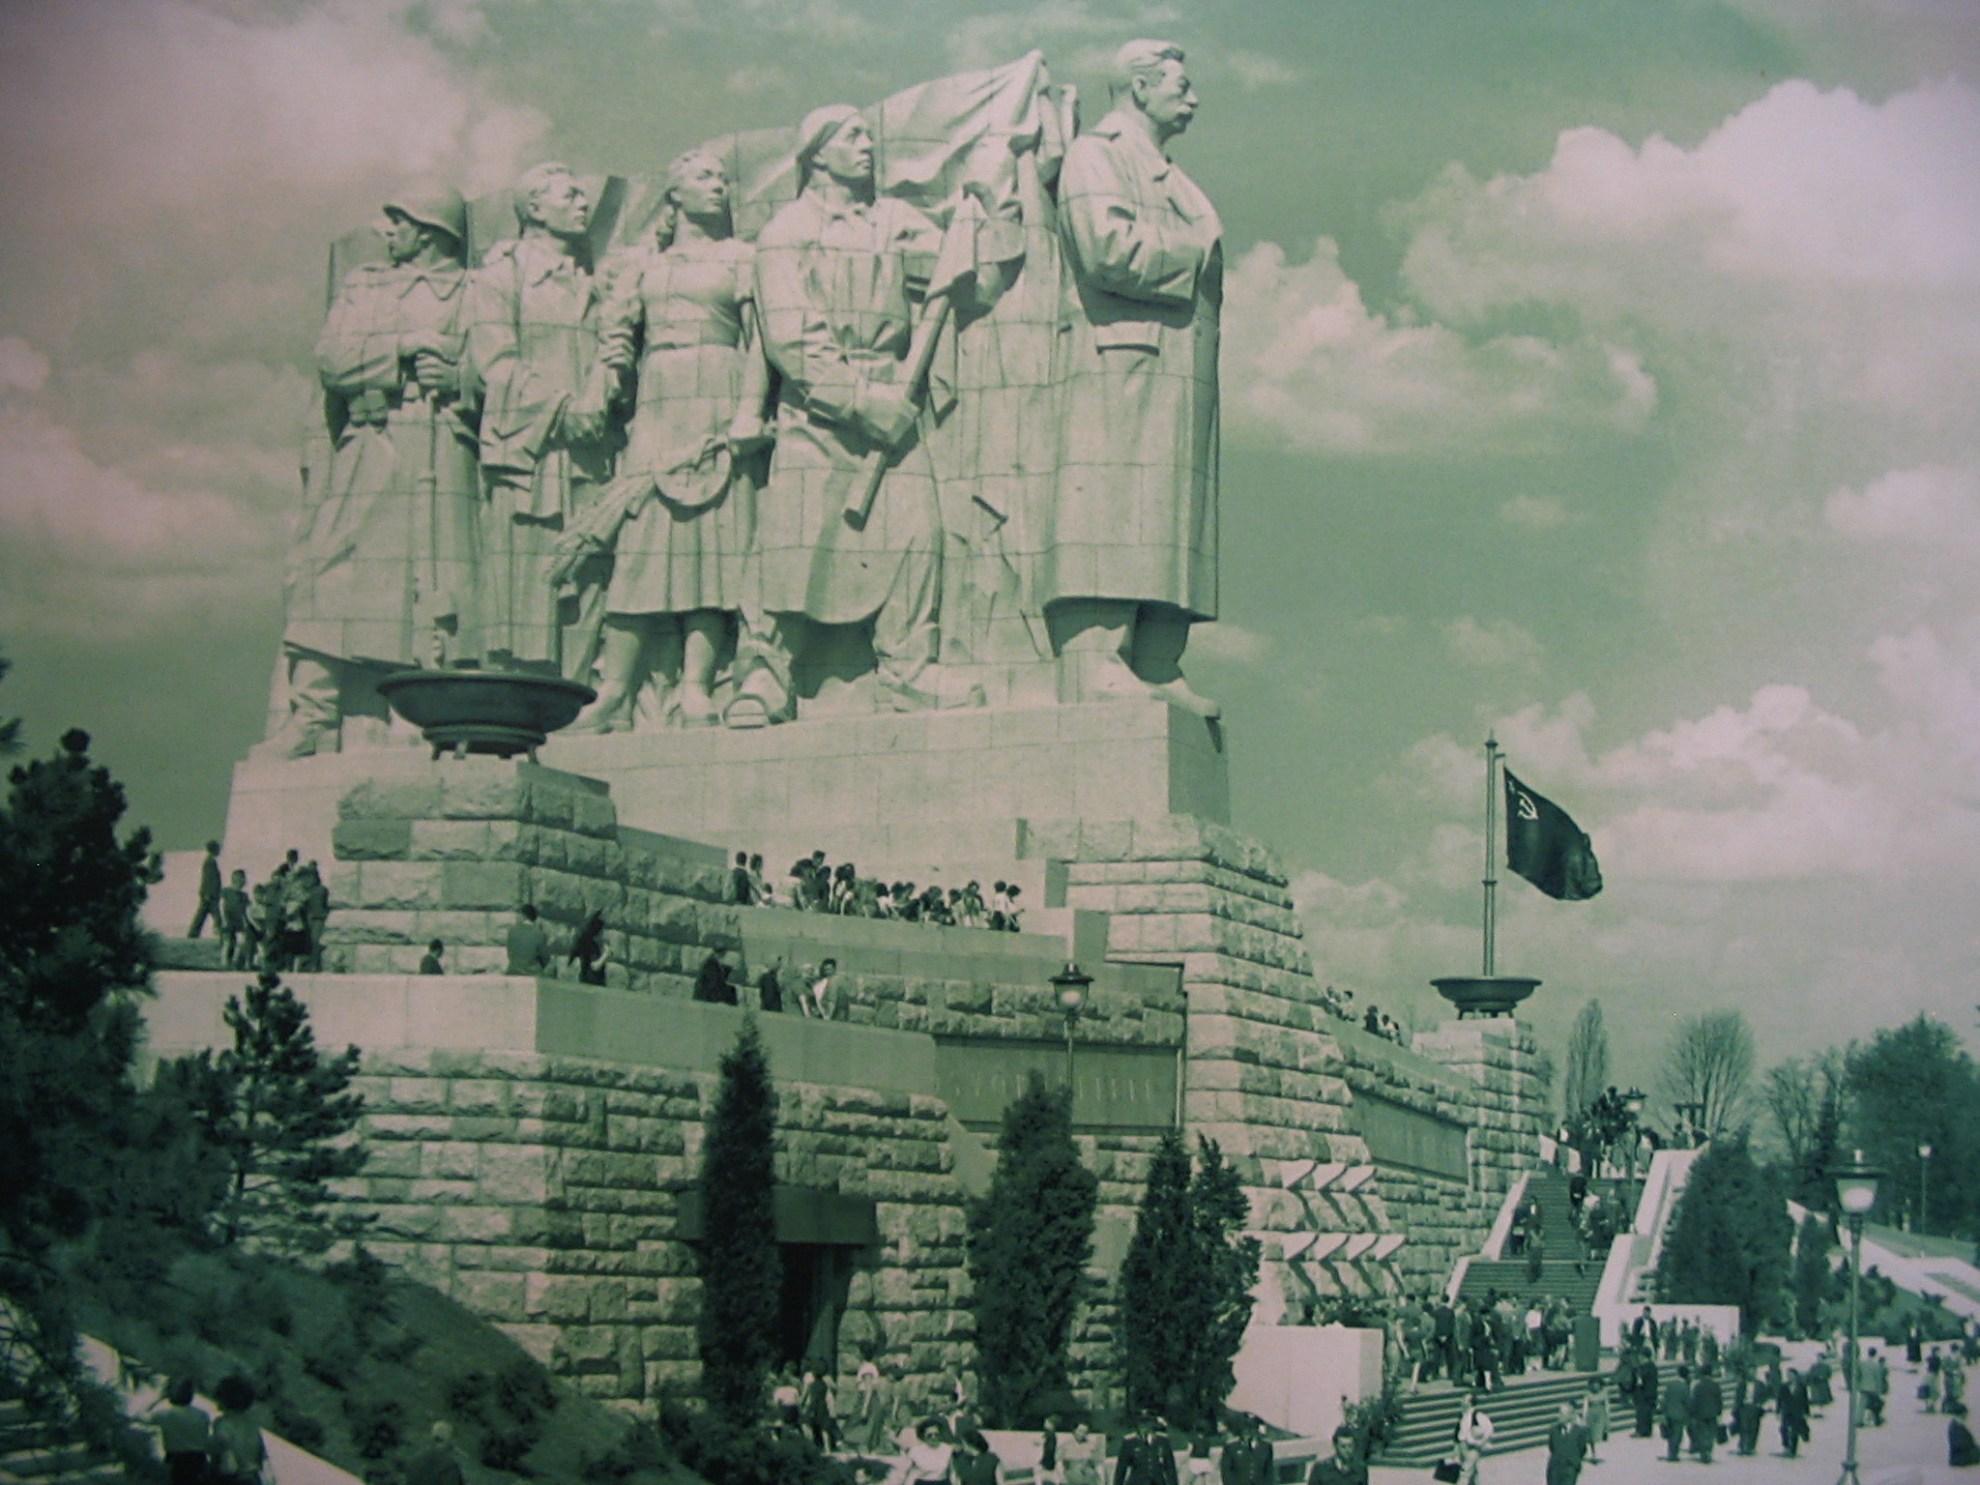 stalins-monument-was-a-massive-granite-statue-honoring-joseph-stalin-in-prague-built-1955-destroyed-1962.jpg